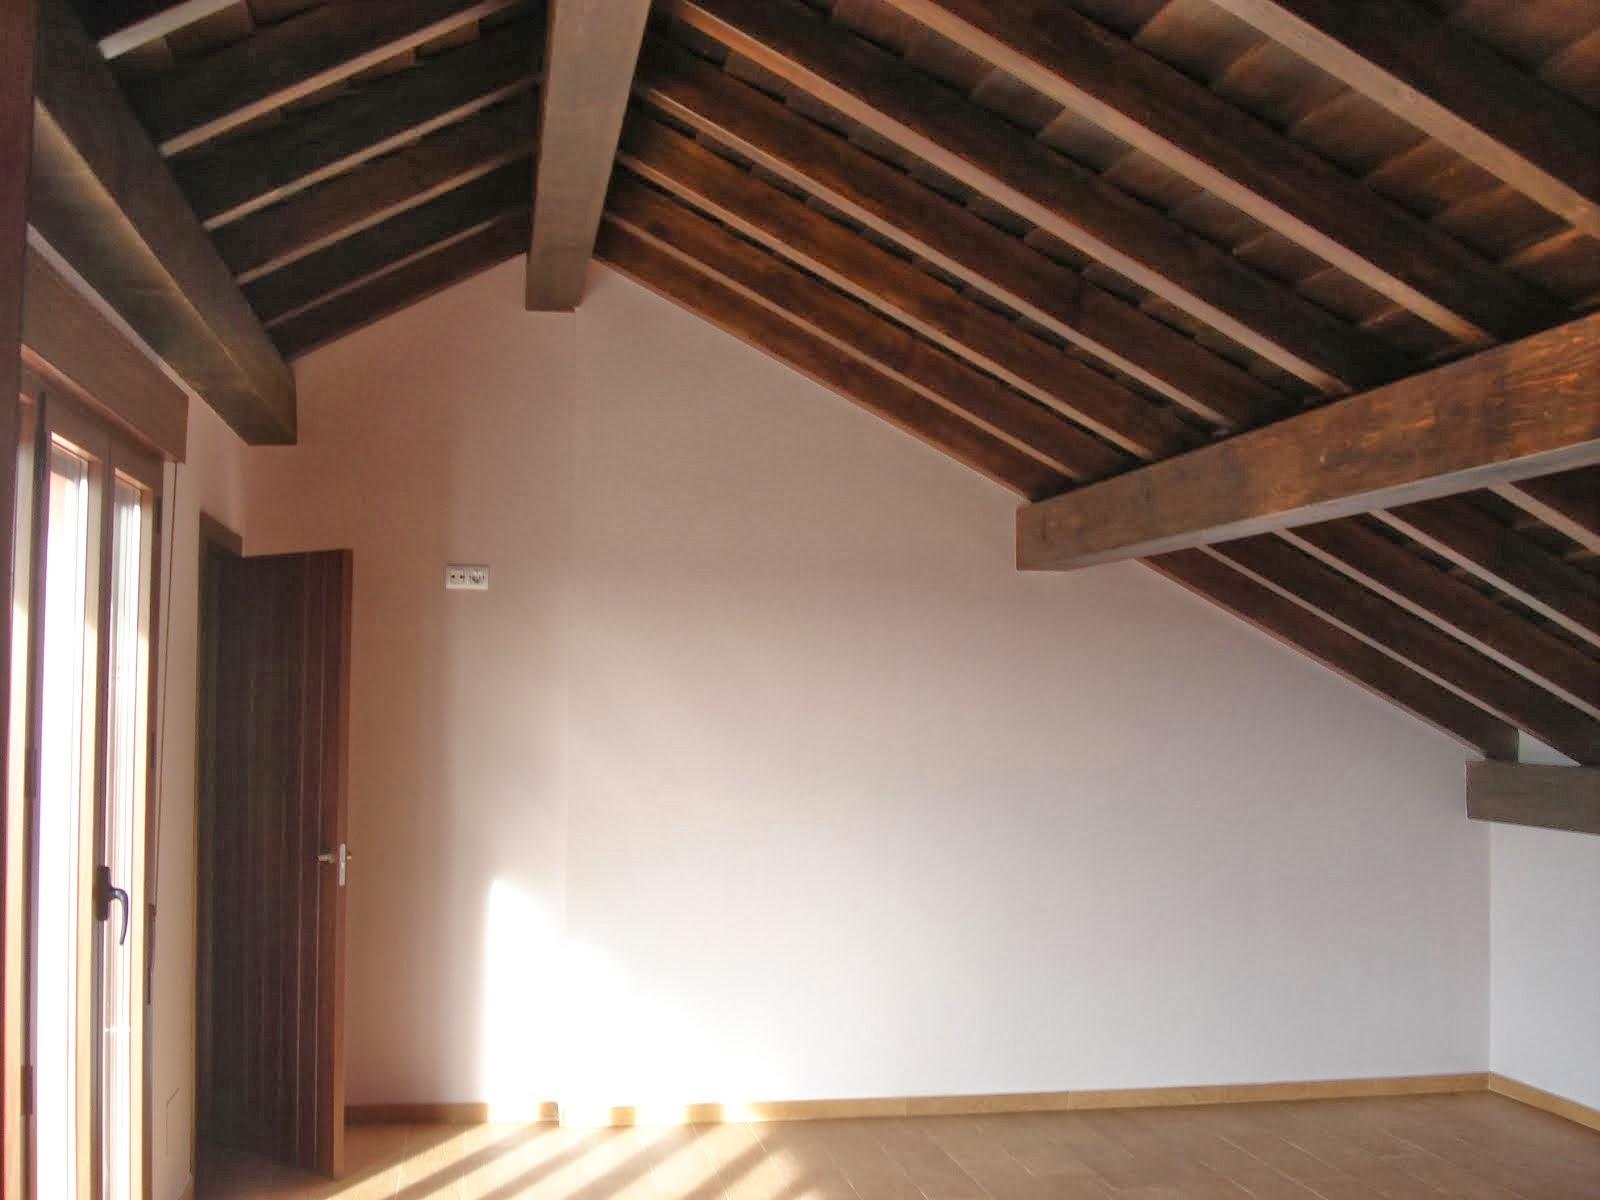 Alicantina teja plana alicantina teja plana teja arabe for Tejados de madera antiguos